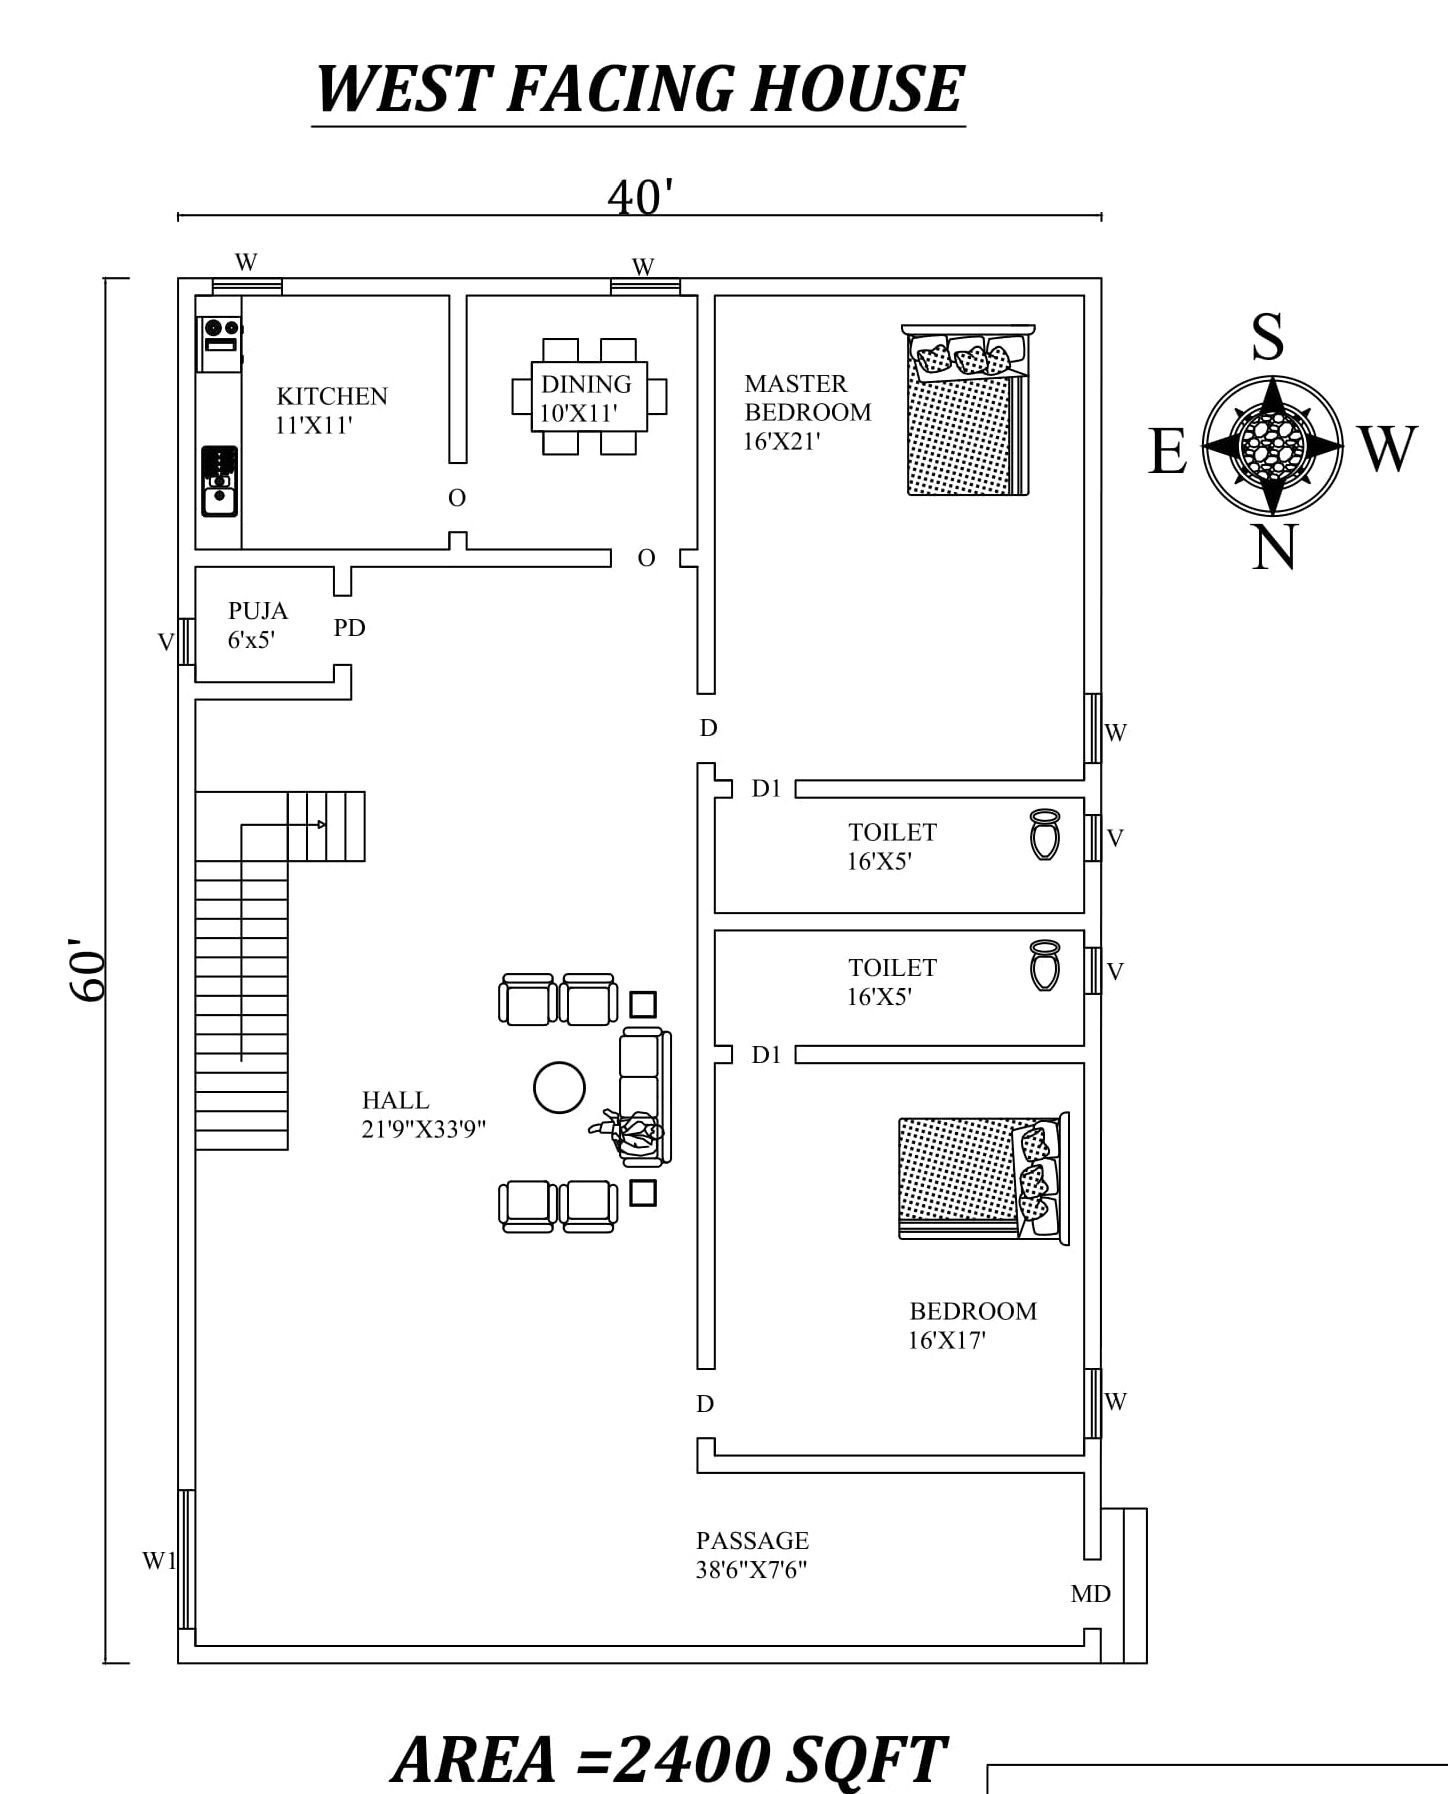 40 x60 2 bhk west facing house plan as per vastu shastra